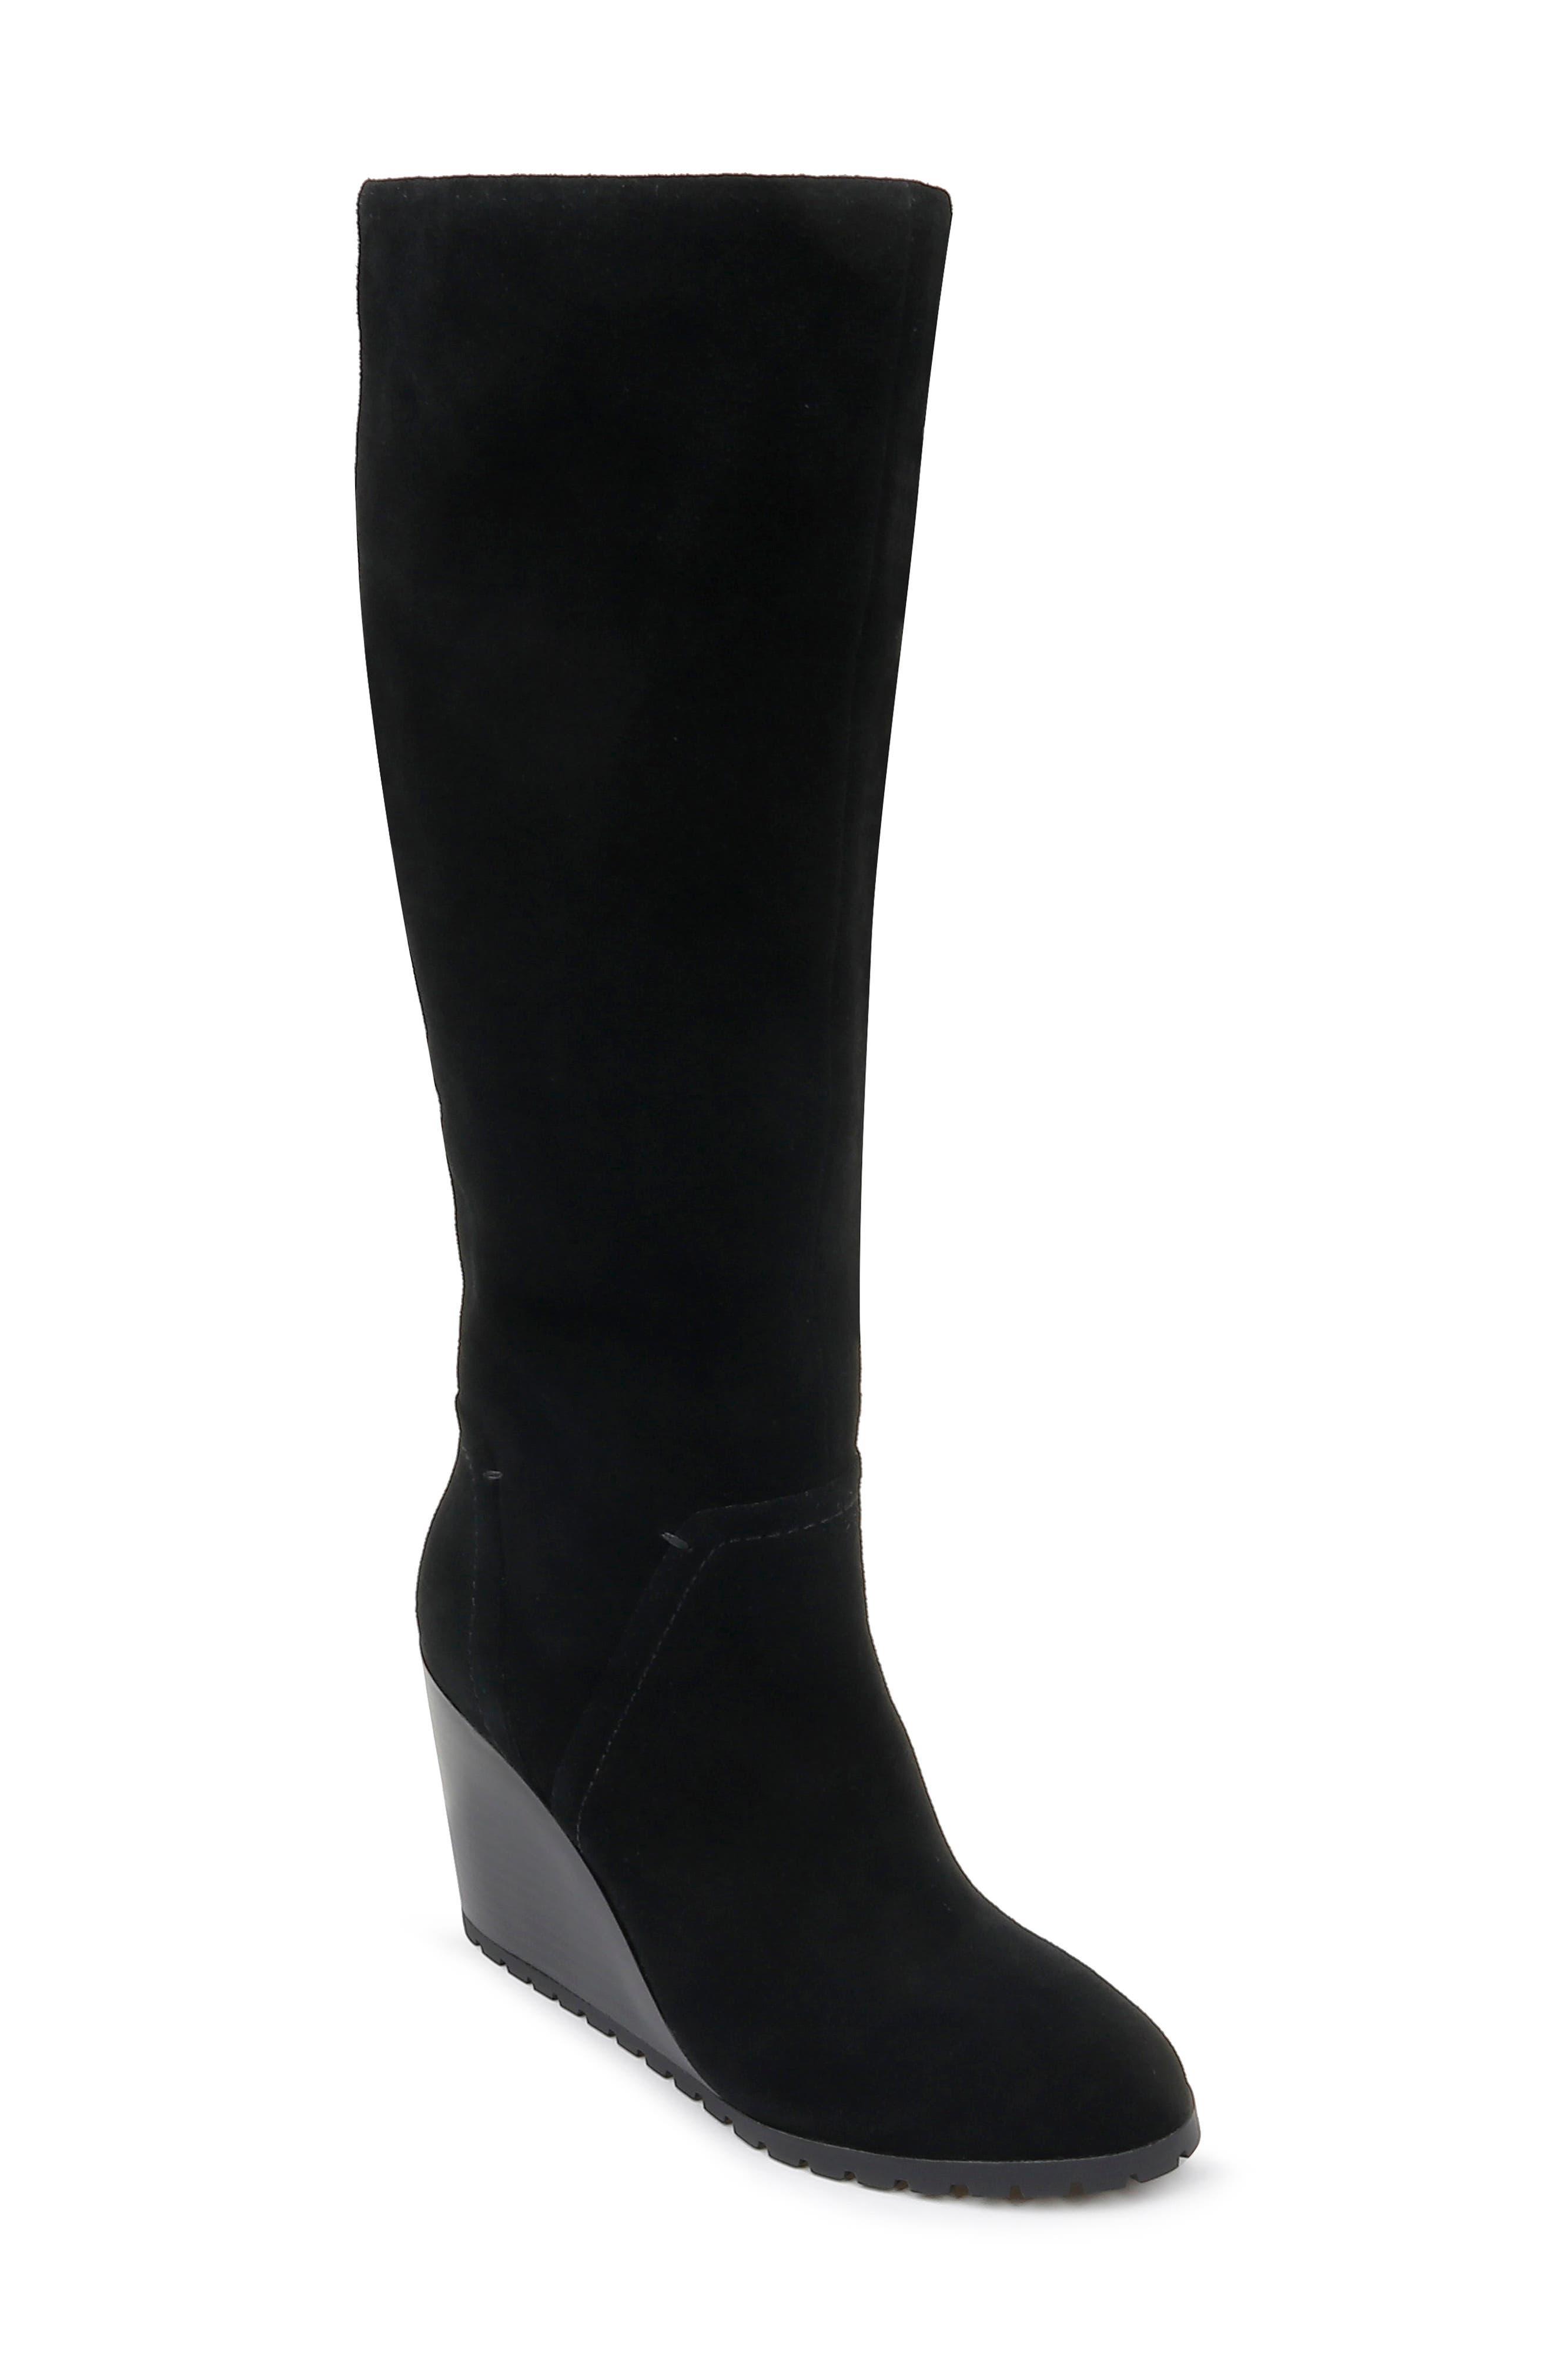 Image of Splendid Patience Knee High Boot